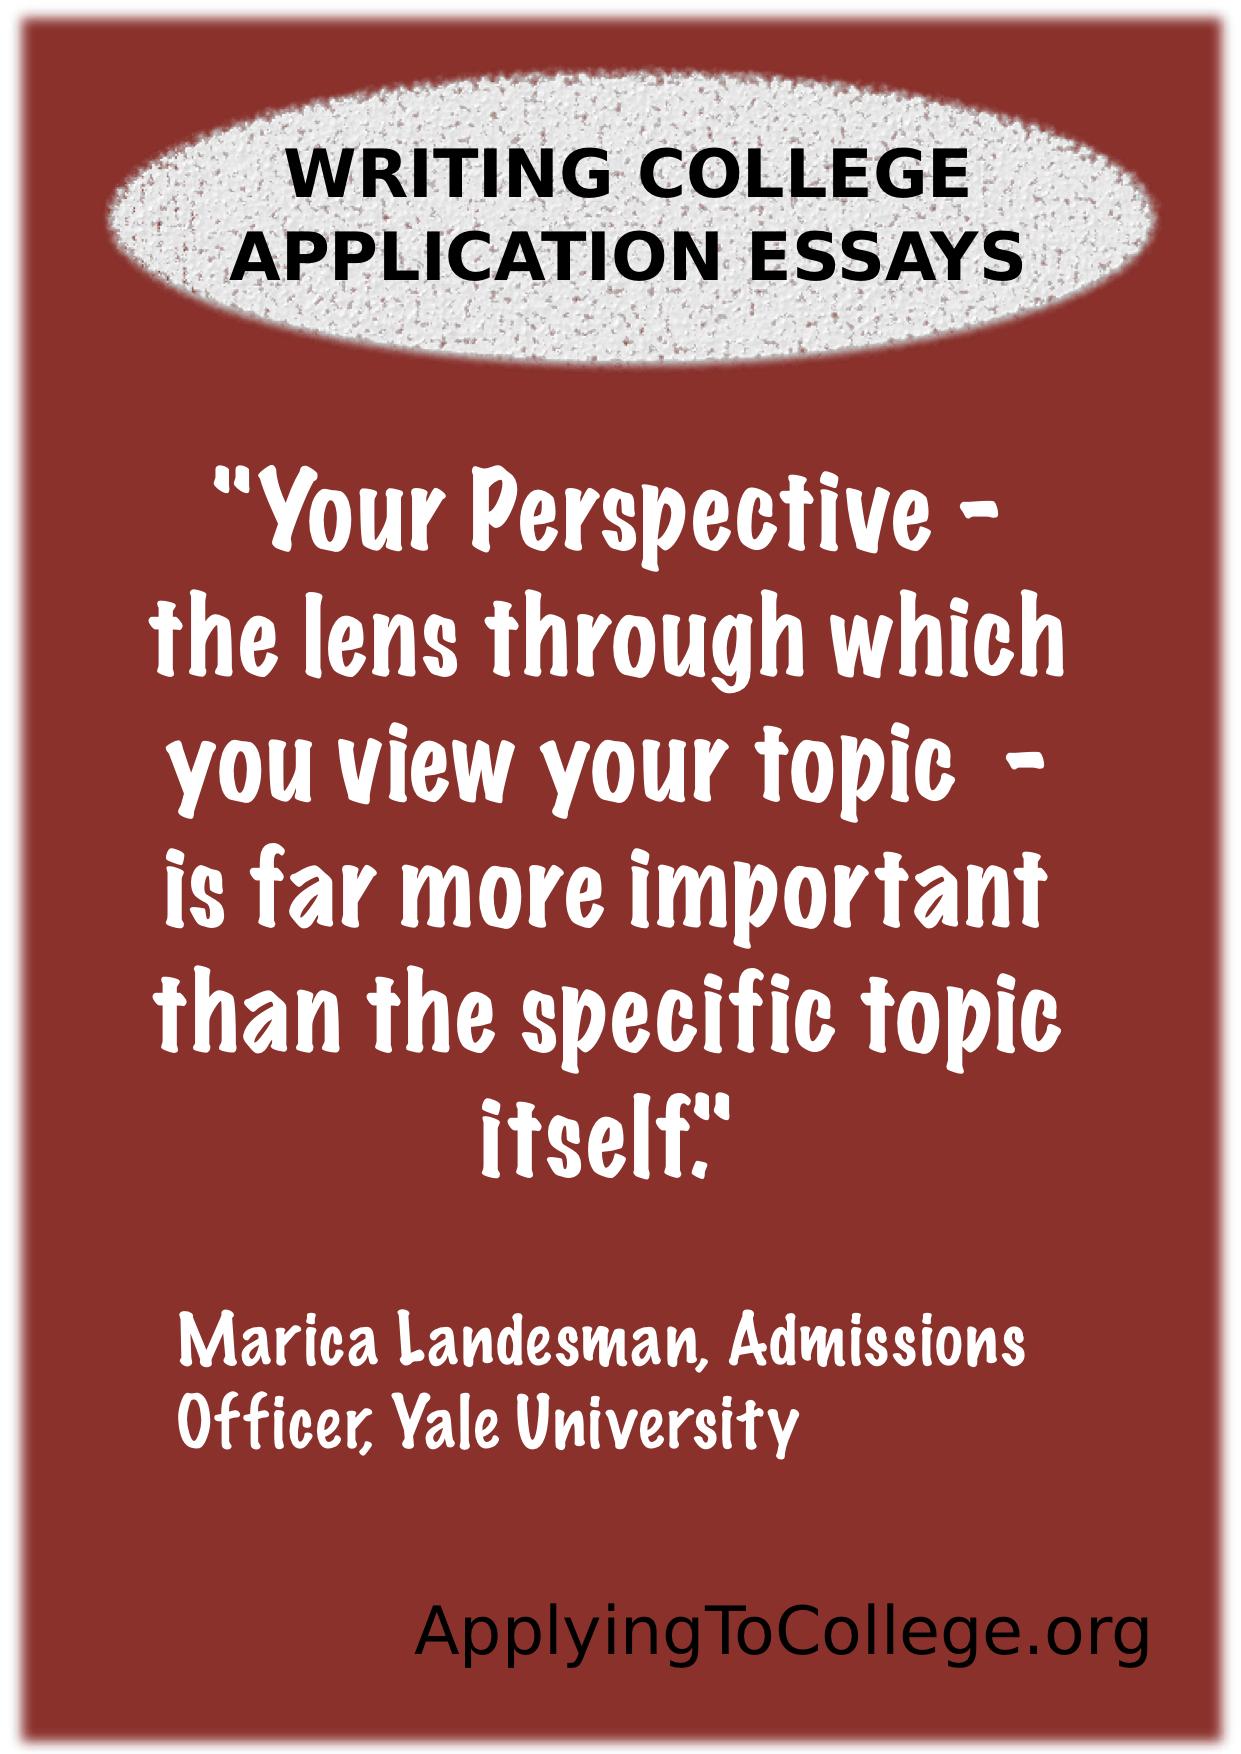 010 Yale Essay Writing Advice Help123 Beautiful Full